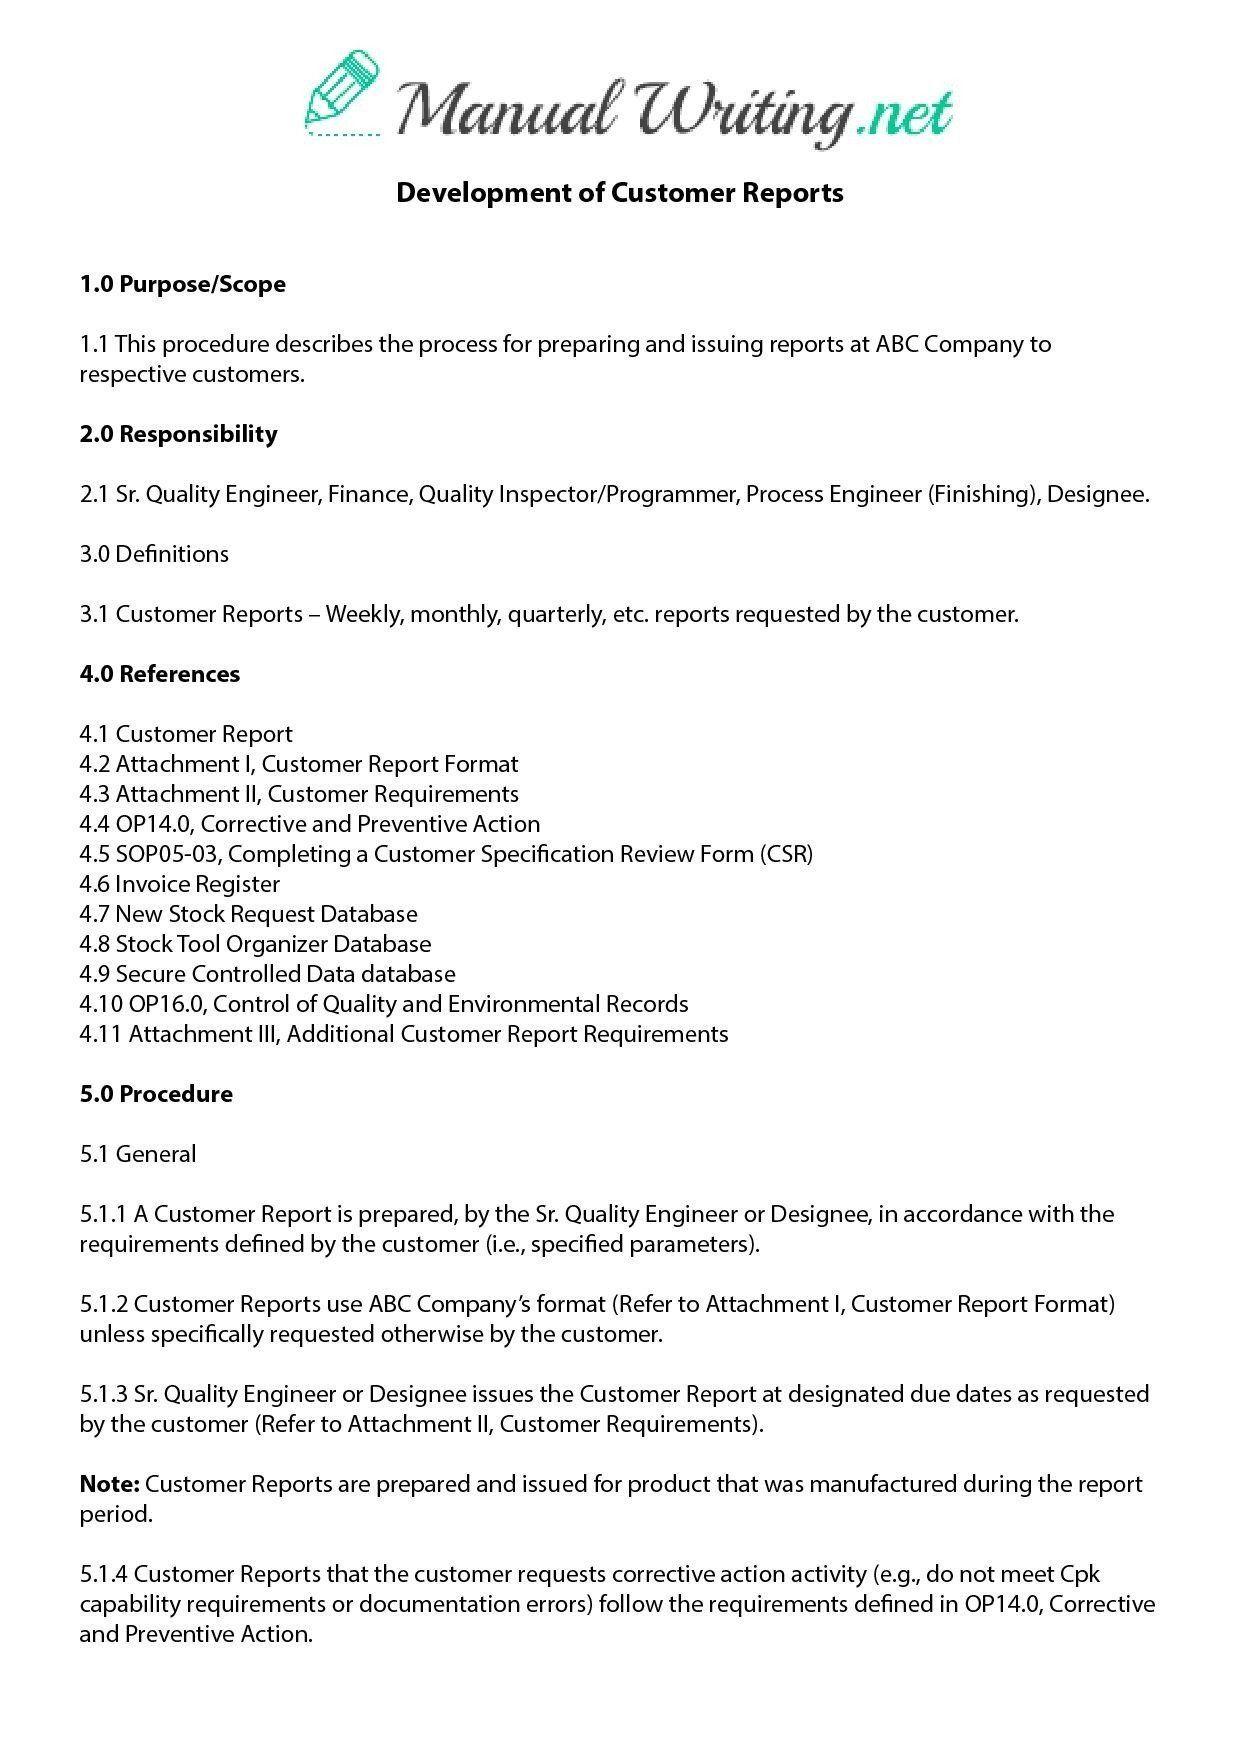 Starbucks Barista Job Description For Resume Elegant Resume For Job Best Quality Control Job Description Resume